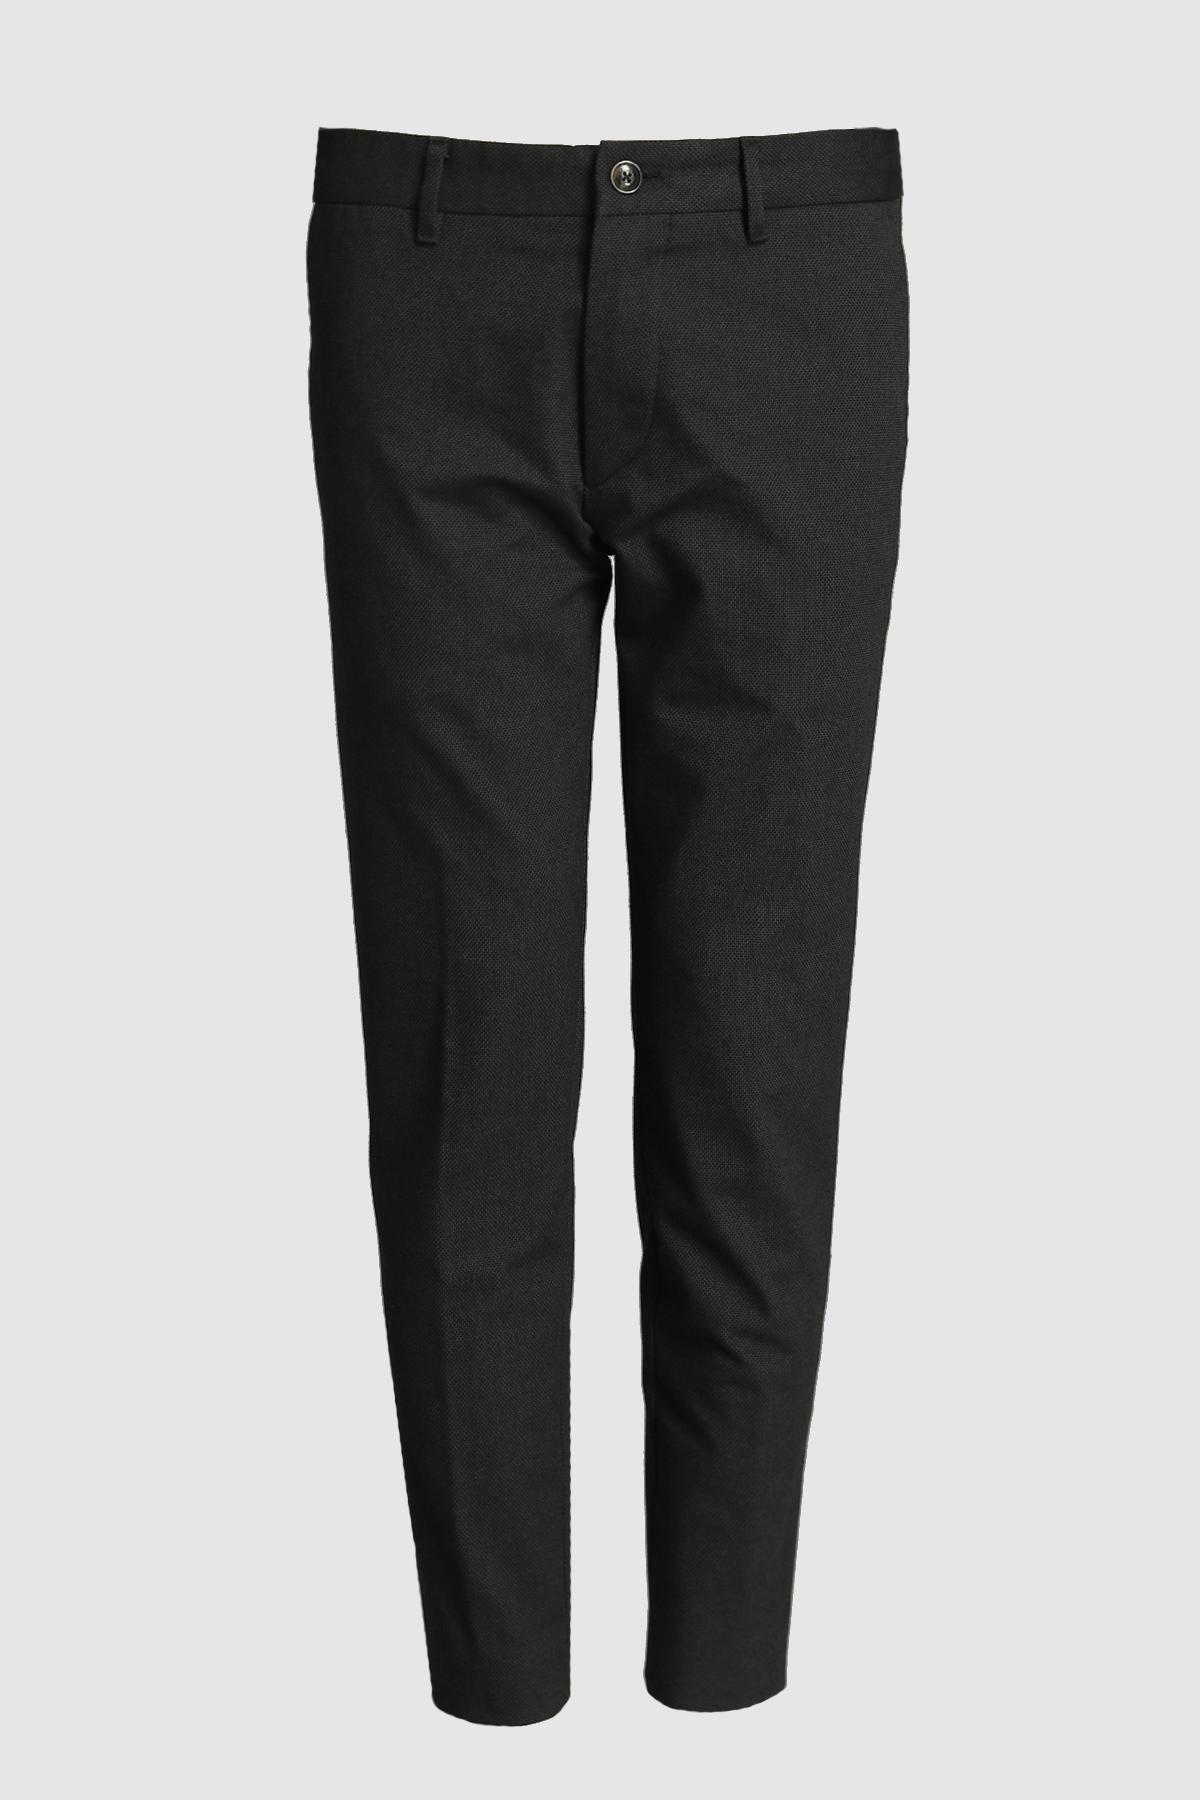 Axis Smart Chino Pantolon Slim Fit Yeşil